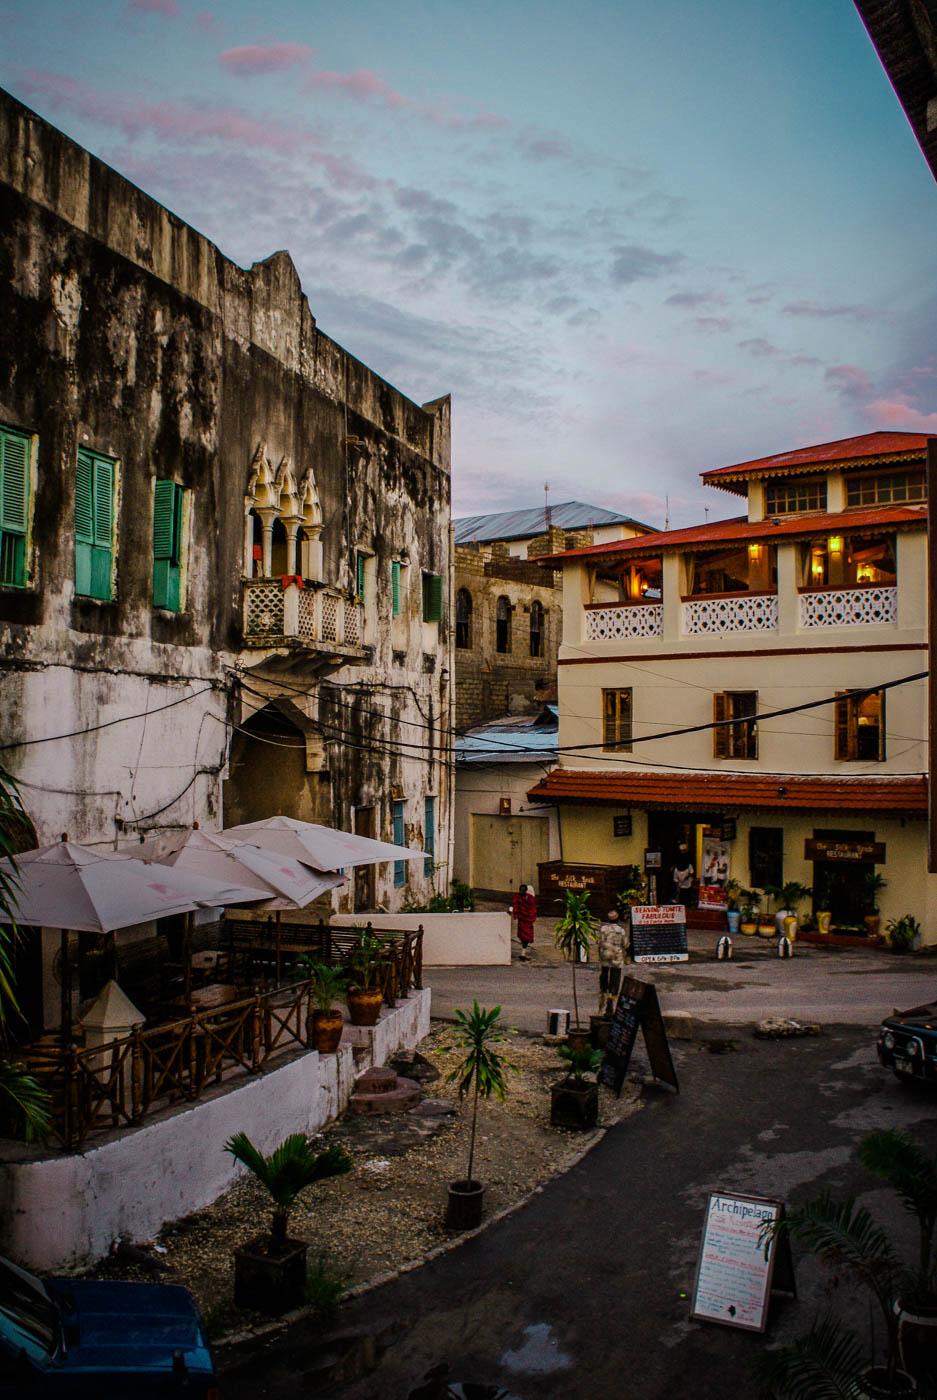 Stone Town - Tanzania and Zanzibar - an exotic adventure. Beaches I Stone Town I Africa Travel I Dar Es Salaam #traveldestinations #traveltheworld #tanzania